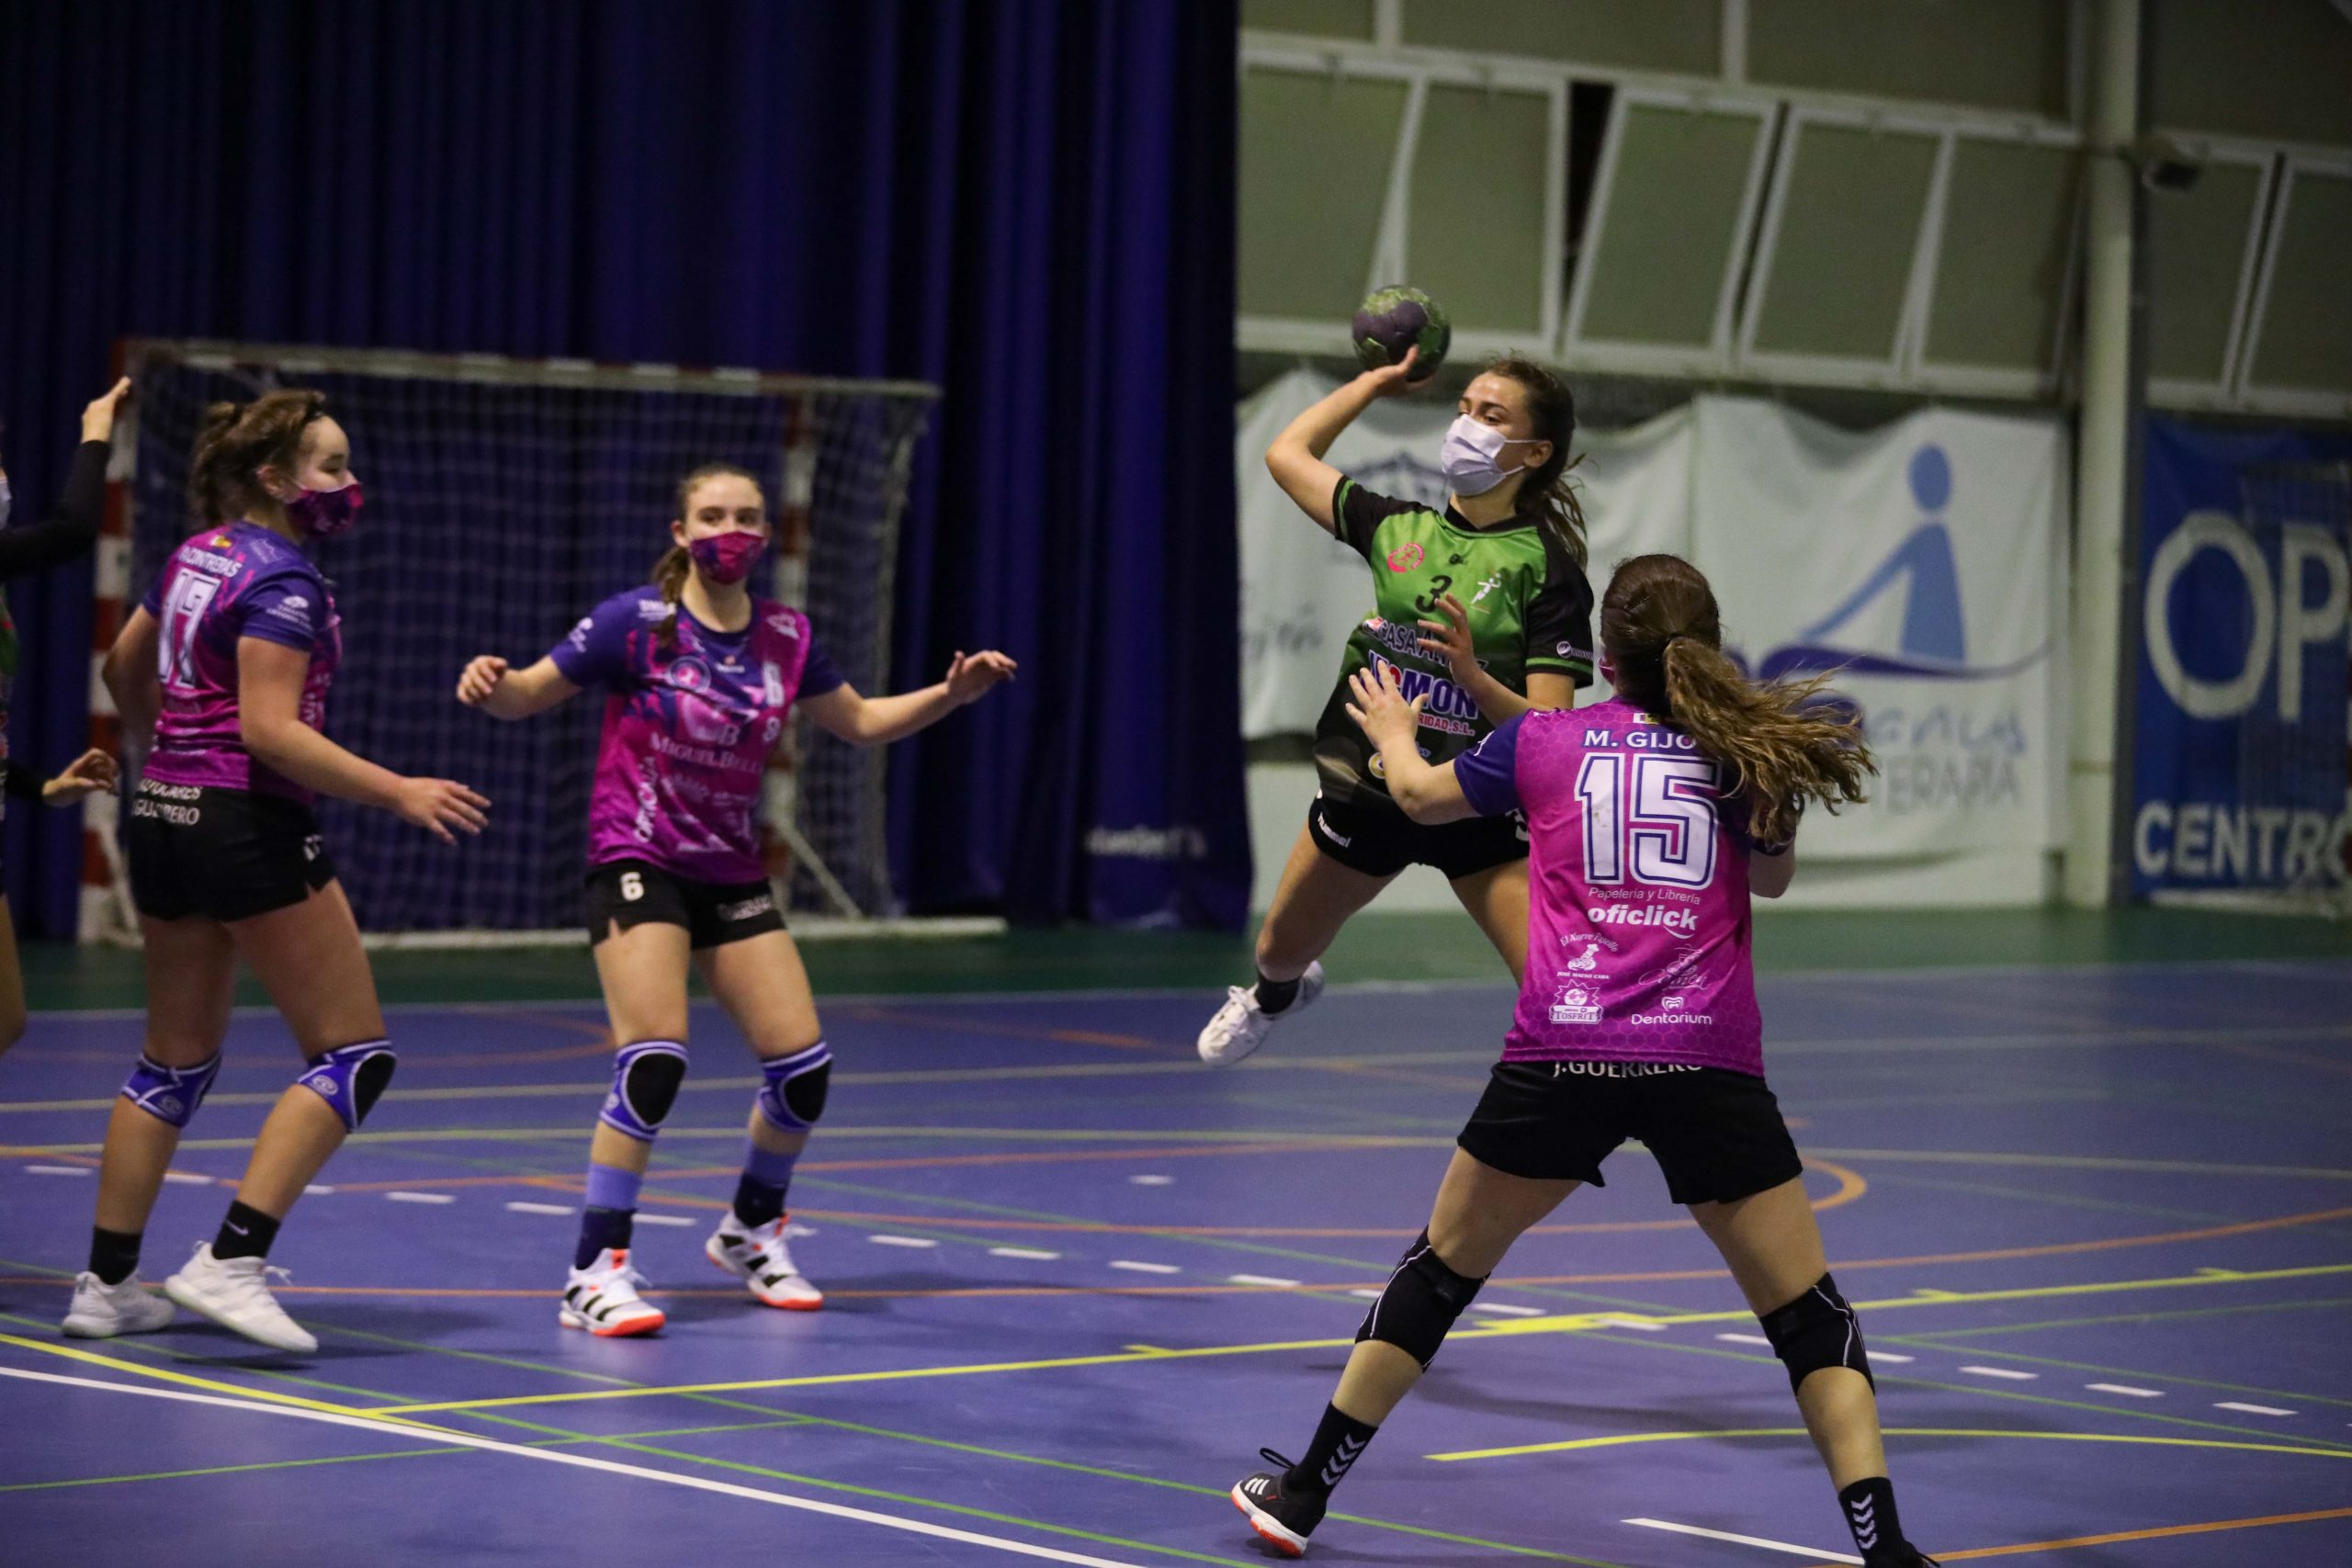 tosfrit apoya el deporte femenino